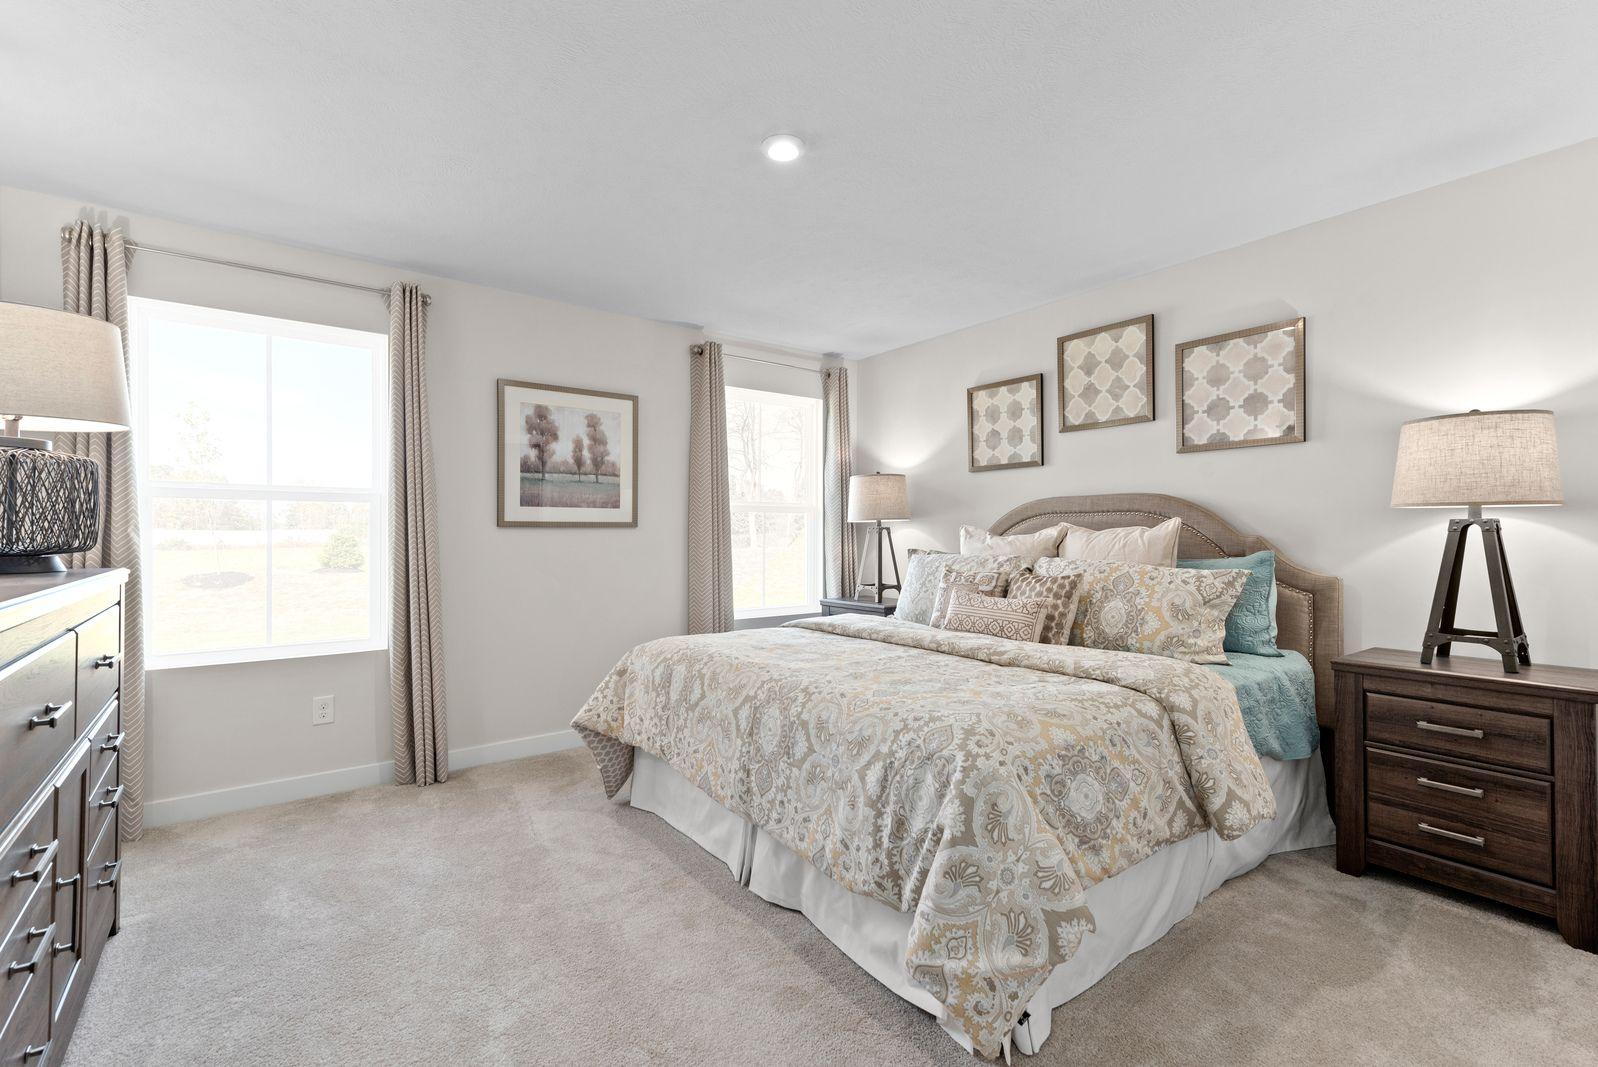 Bedroom featured in the Barbados Isle By Ryan Homes in Cincinnati, OH